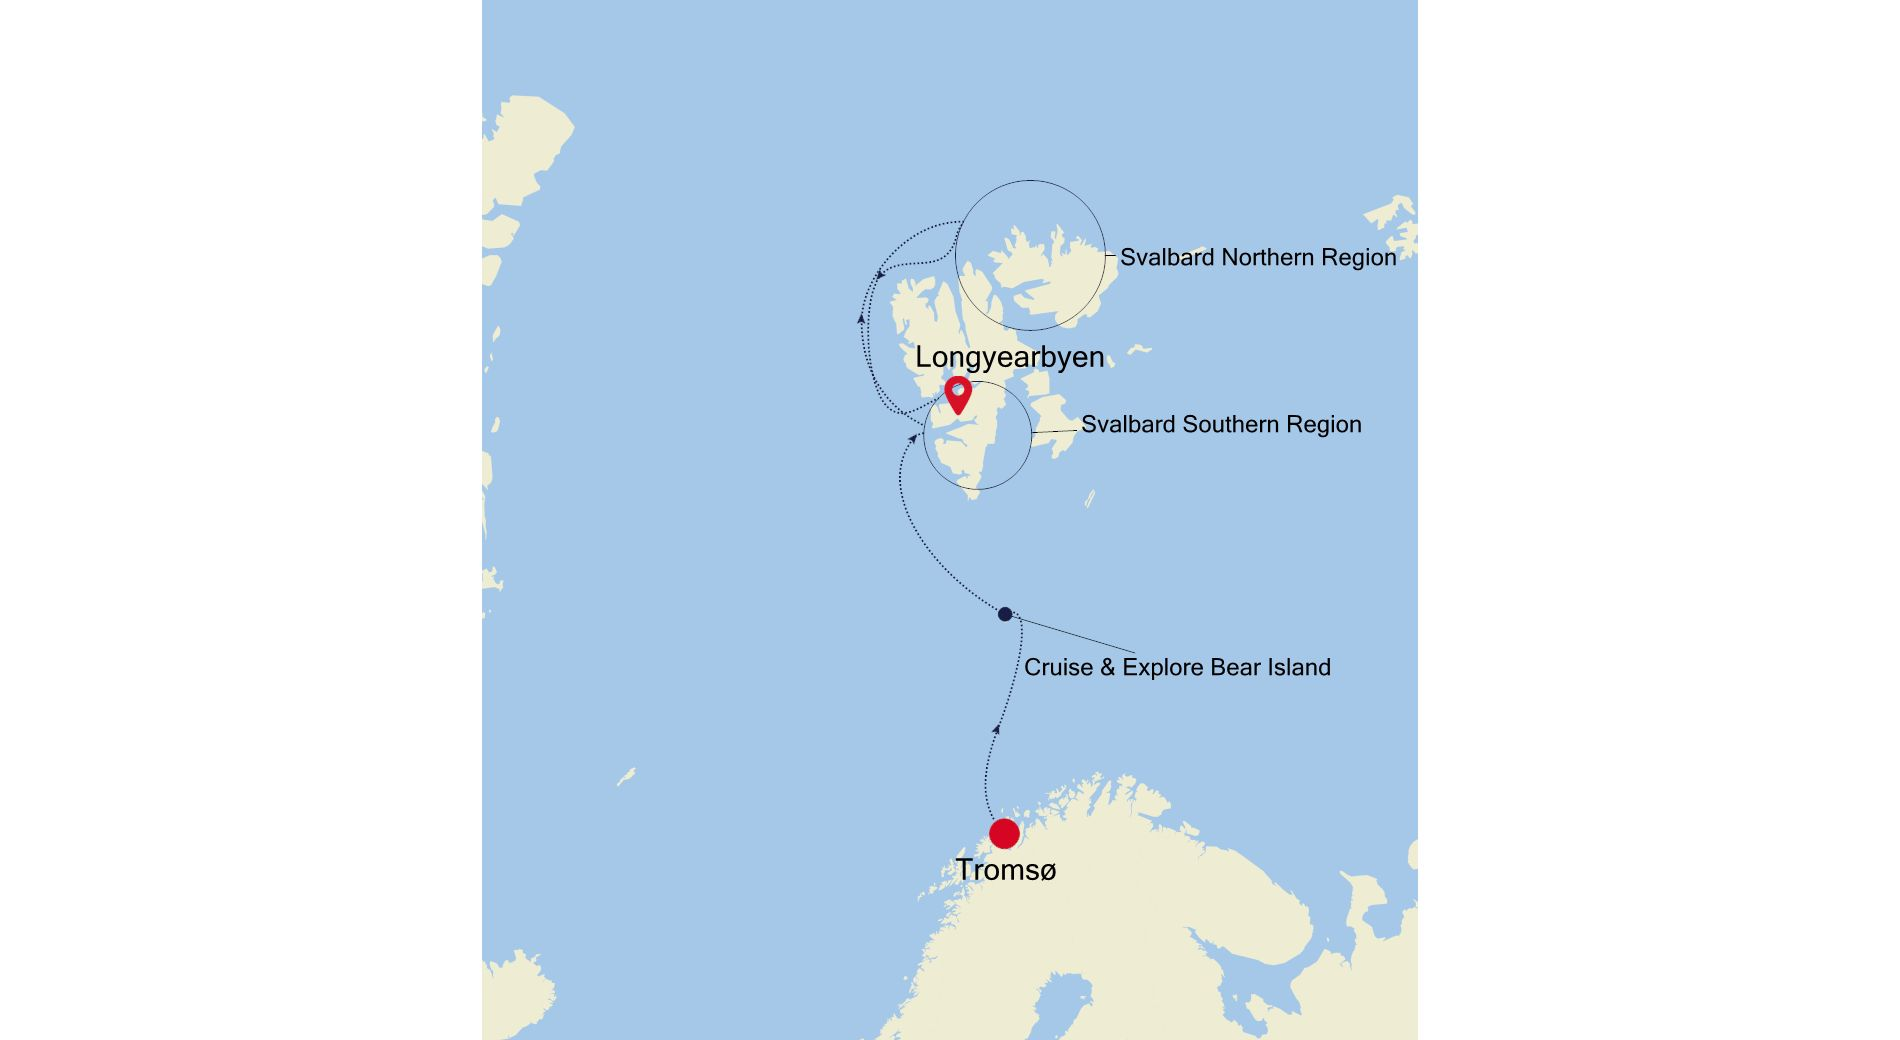 E4200630009 - Tromsø a Longyearbyen